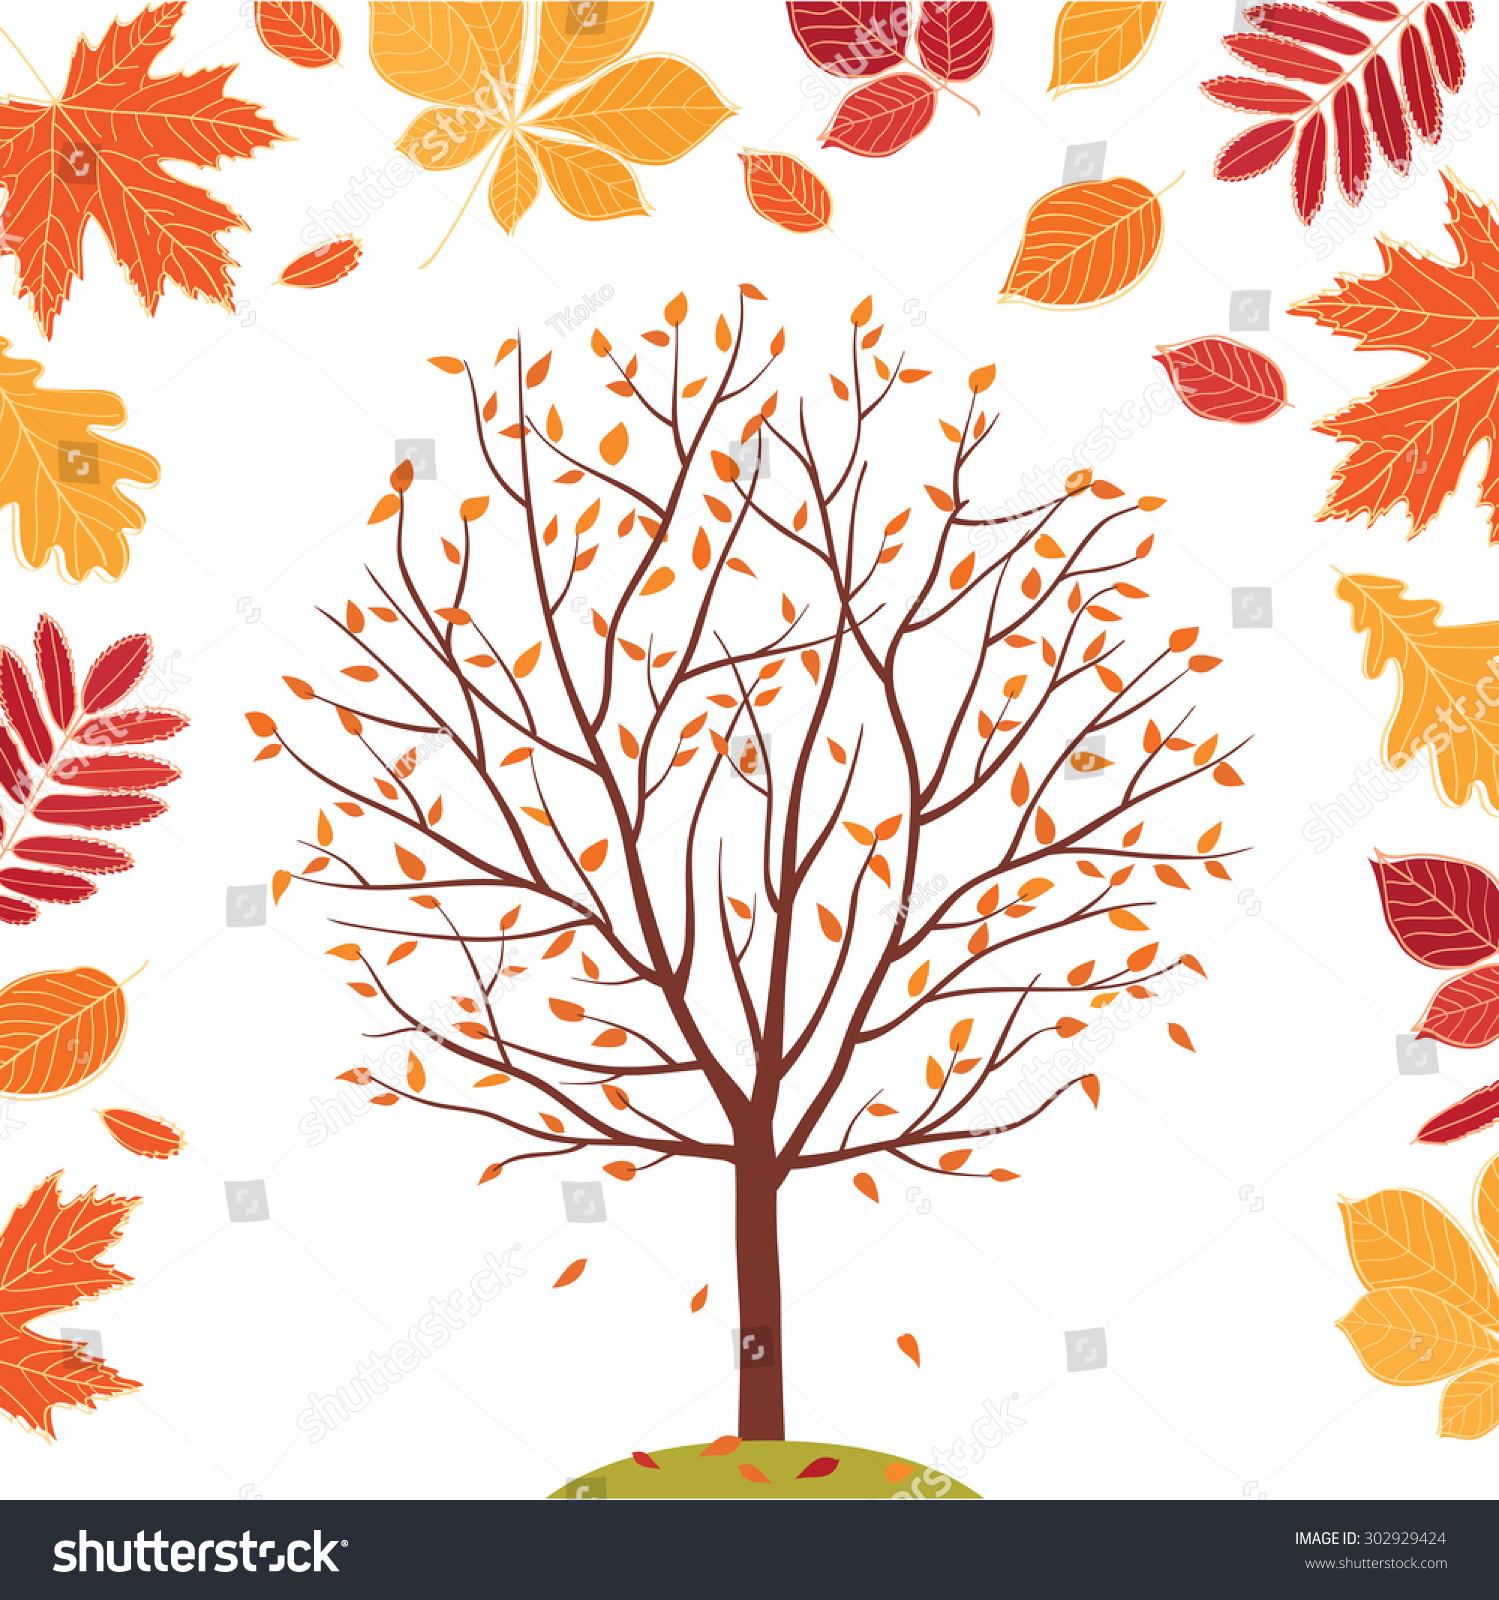 autumn fall tree backgrounds - photo #38